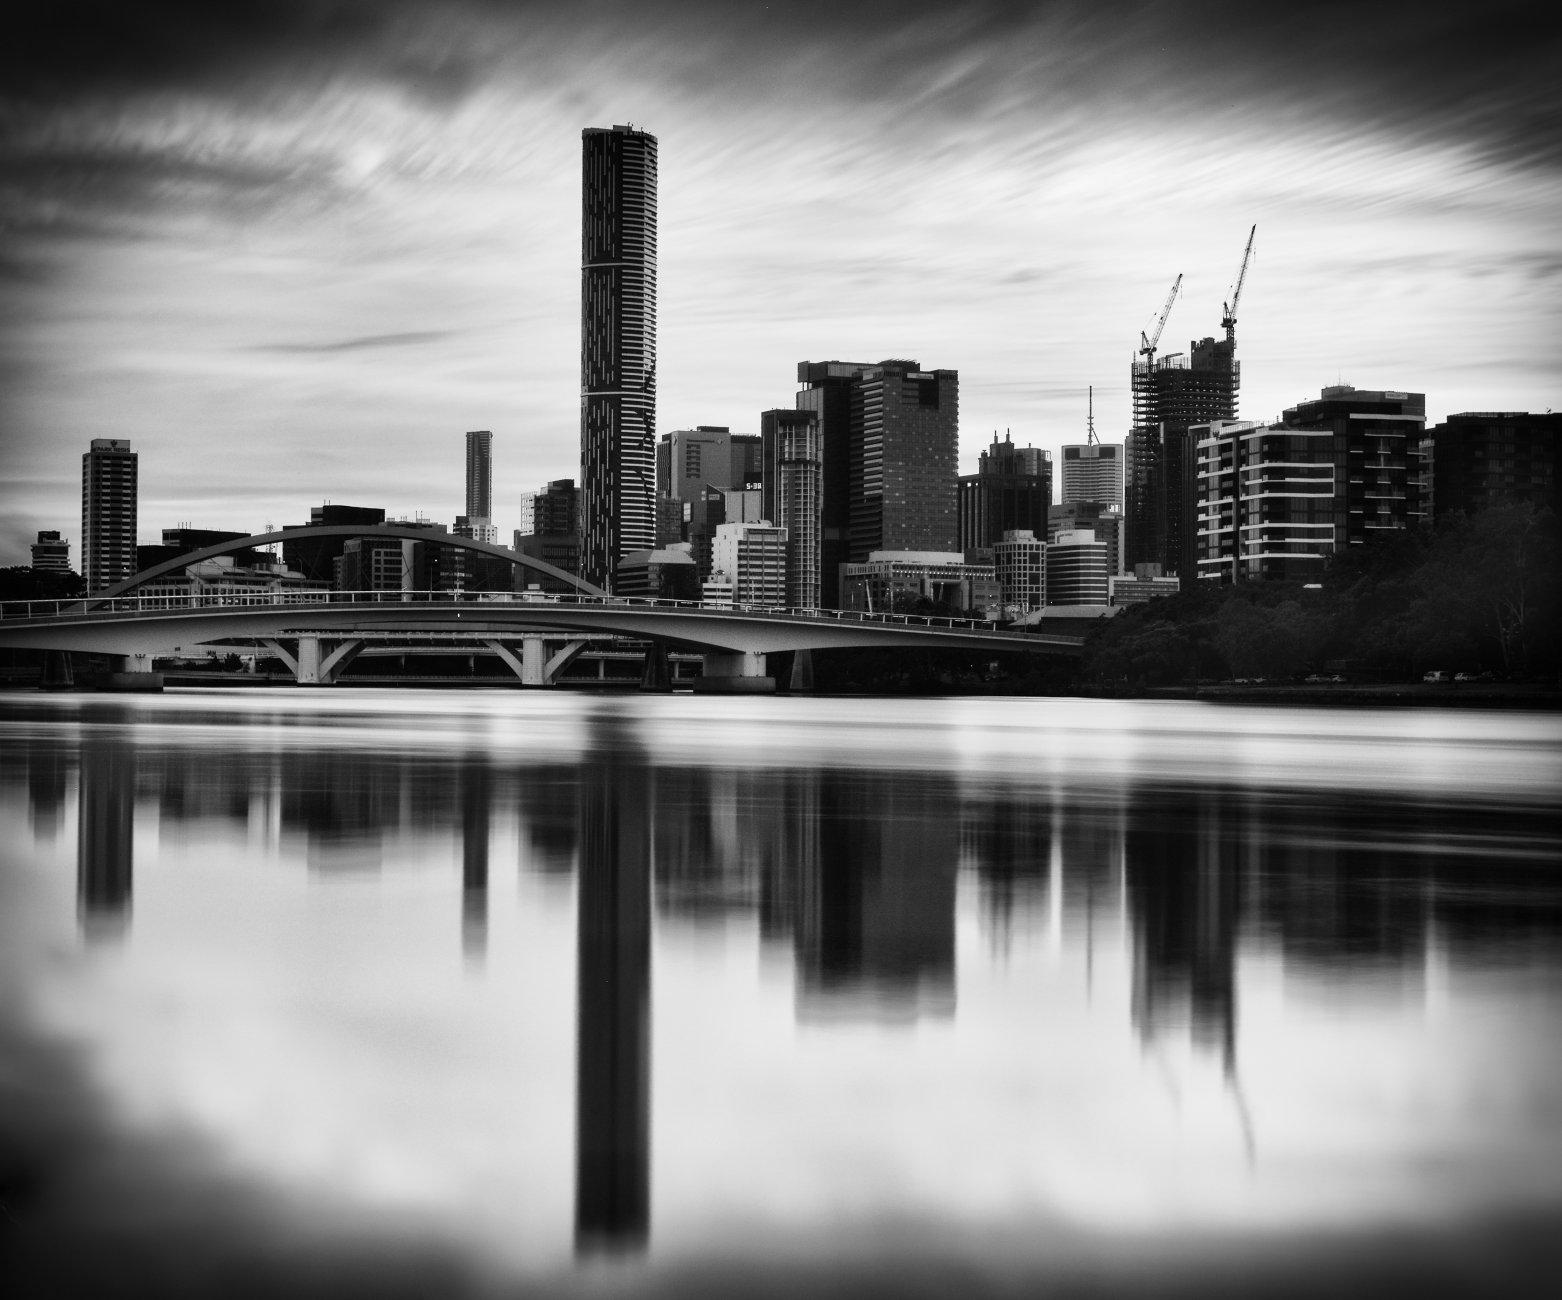 Before Rush Hour, Brisbane River, Queensland